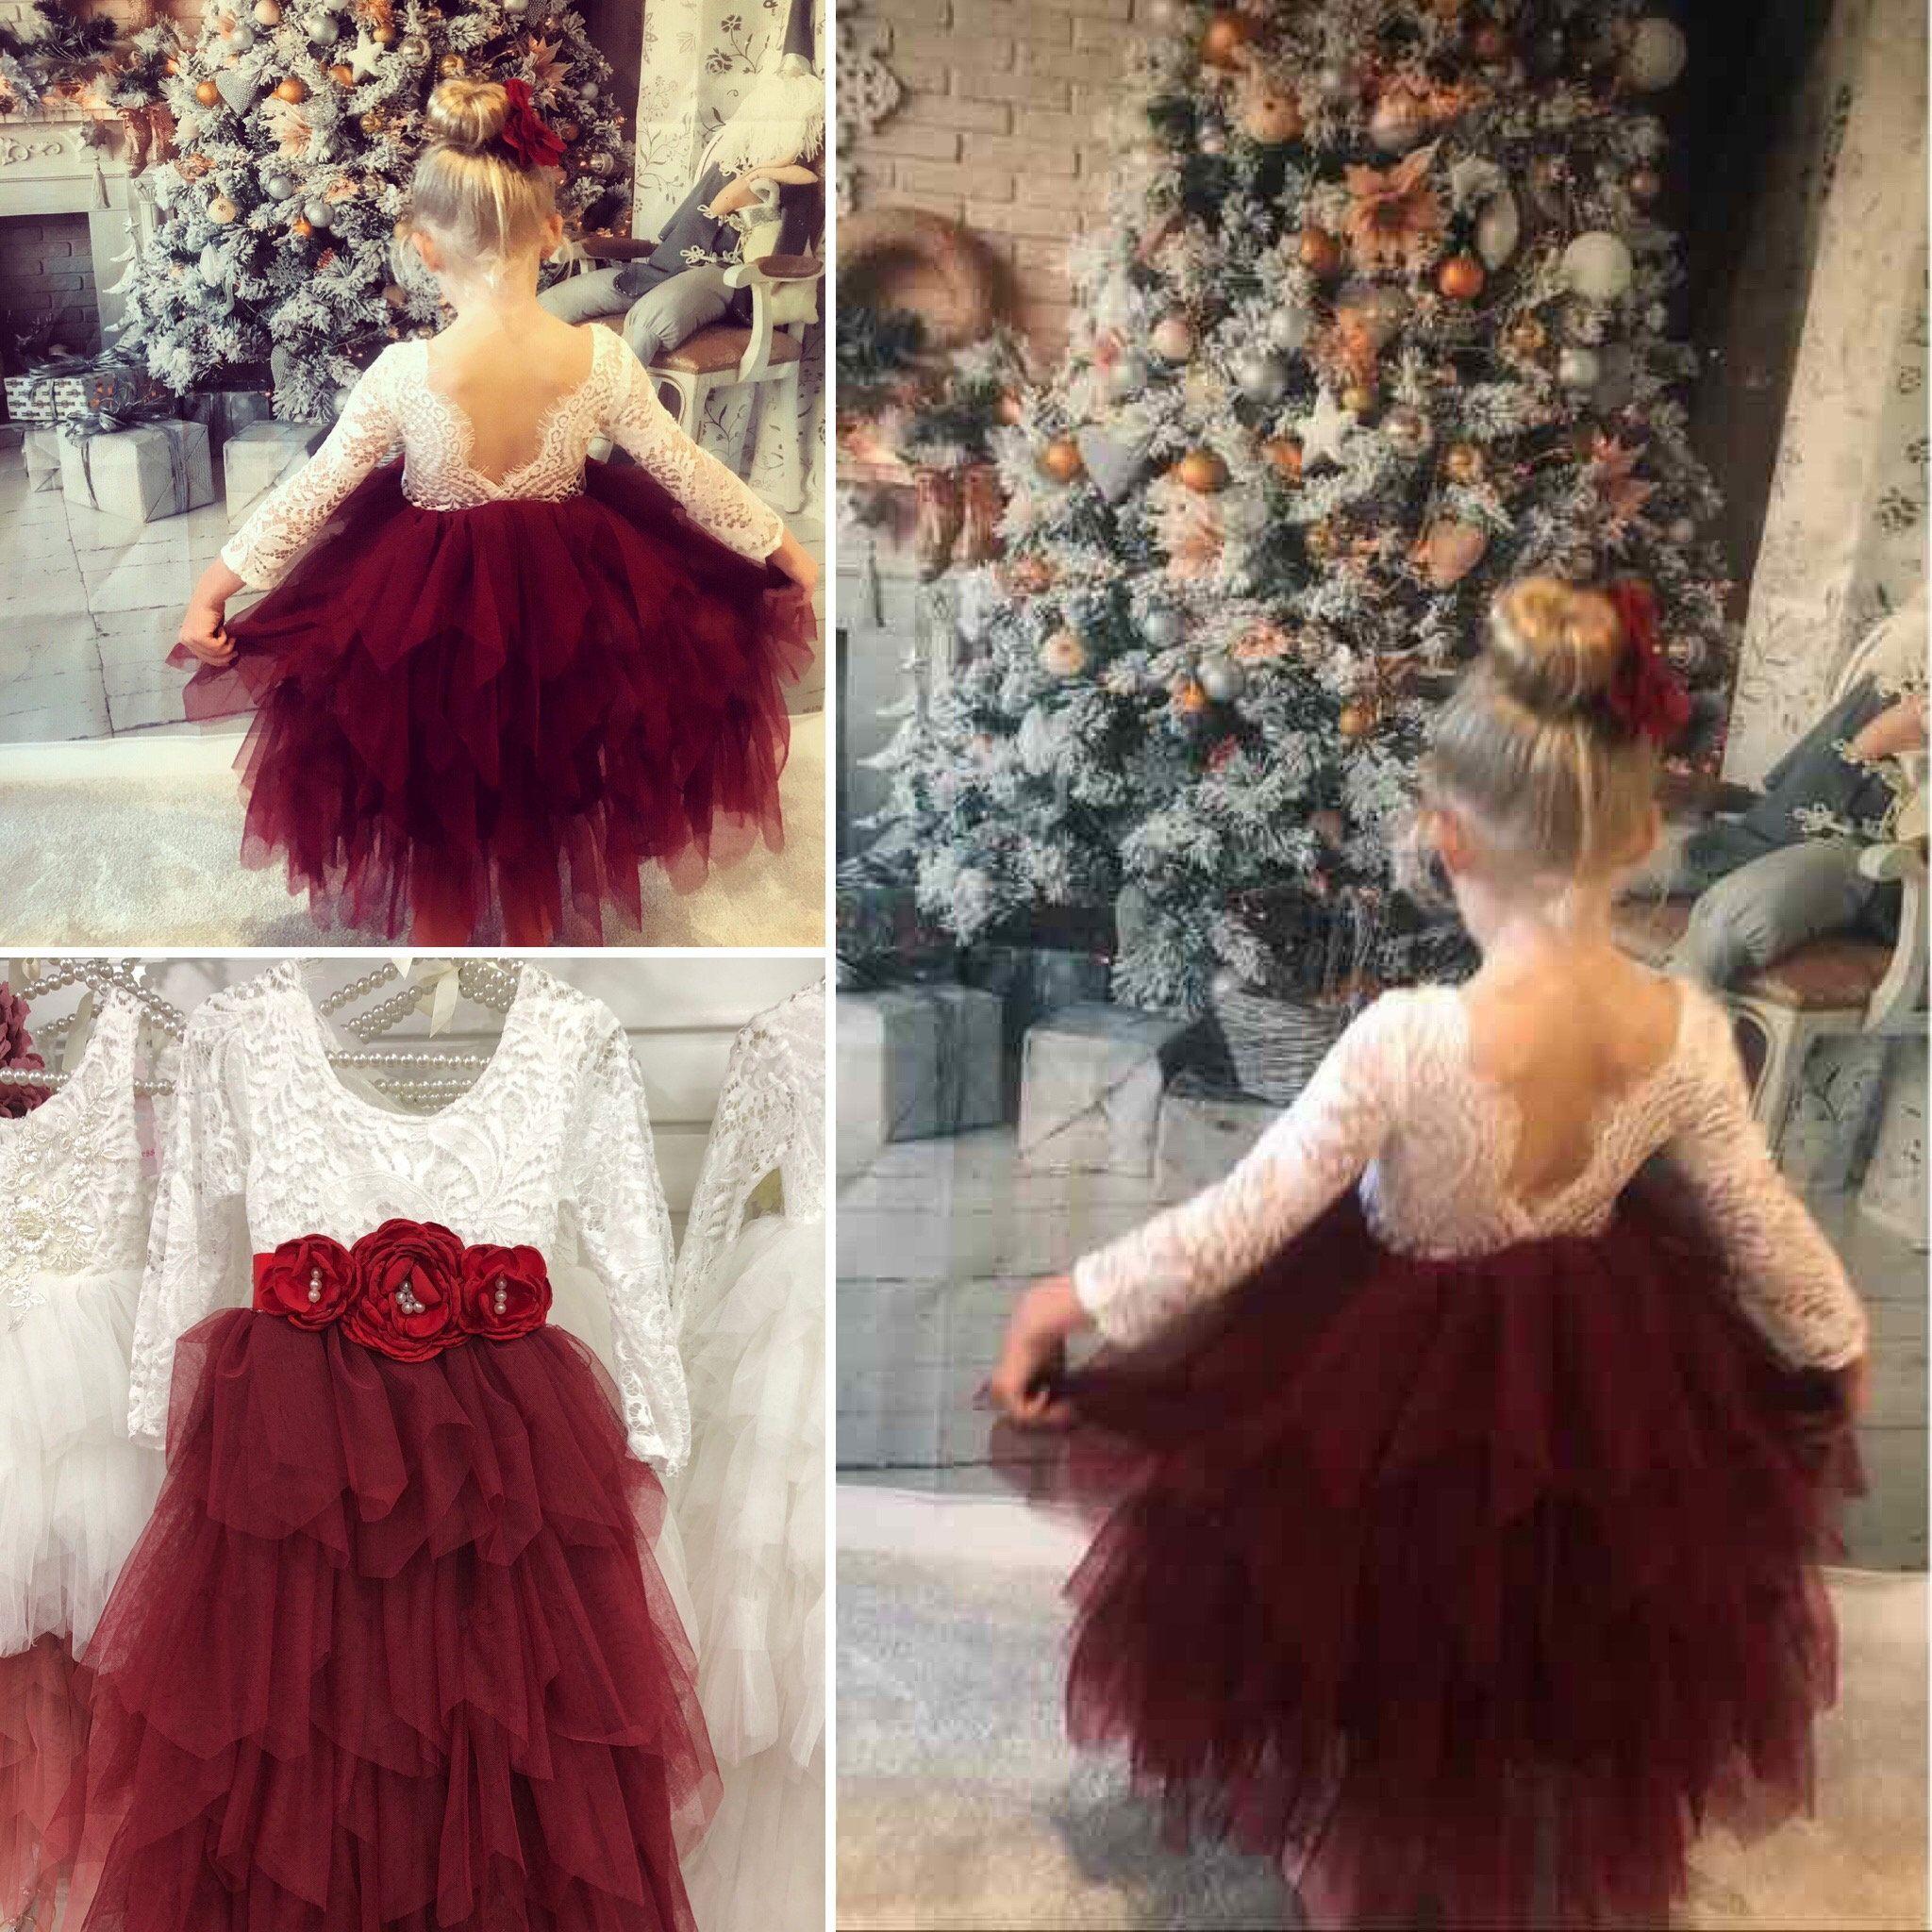 Long Ruffles Bohemian Flower Girl Dress with Flower Corsage Belt Wine Red